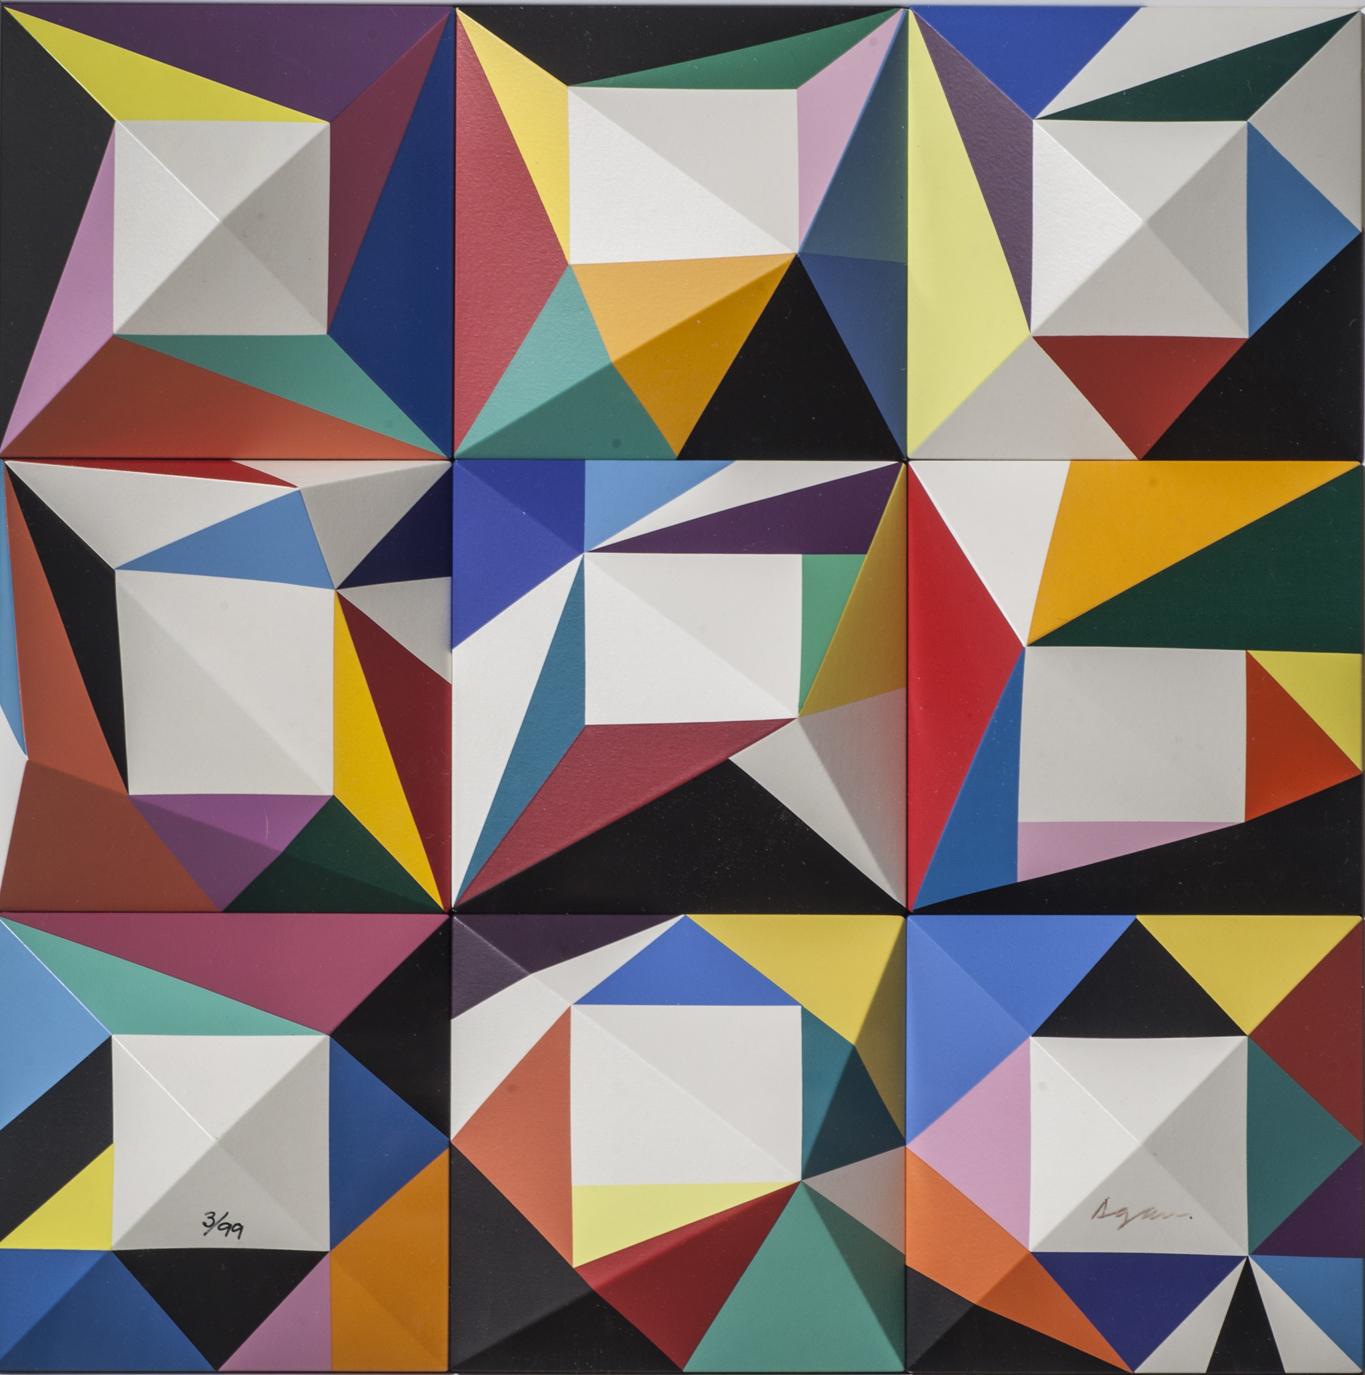 Yaacov Agam, Black Hole, 1985, Original Polymorph, 59x59x4 cm, ed. 3-99